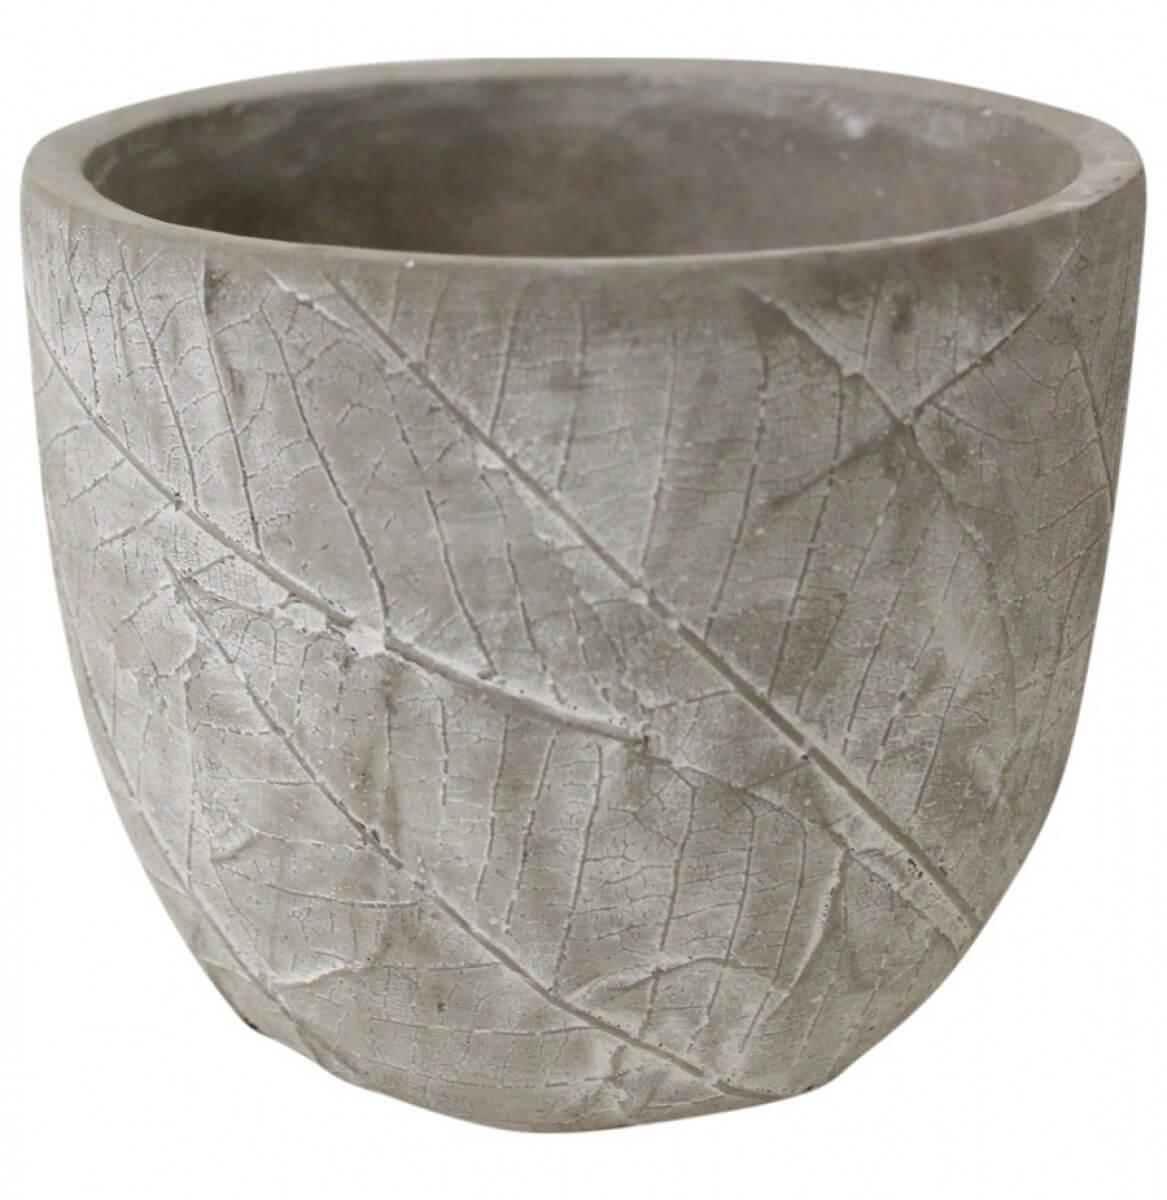 ld3625-4-pot-leaf-edge-medium